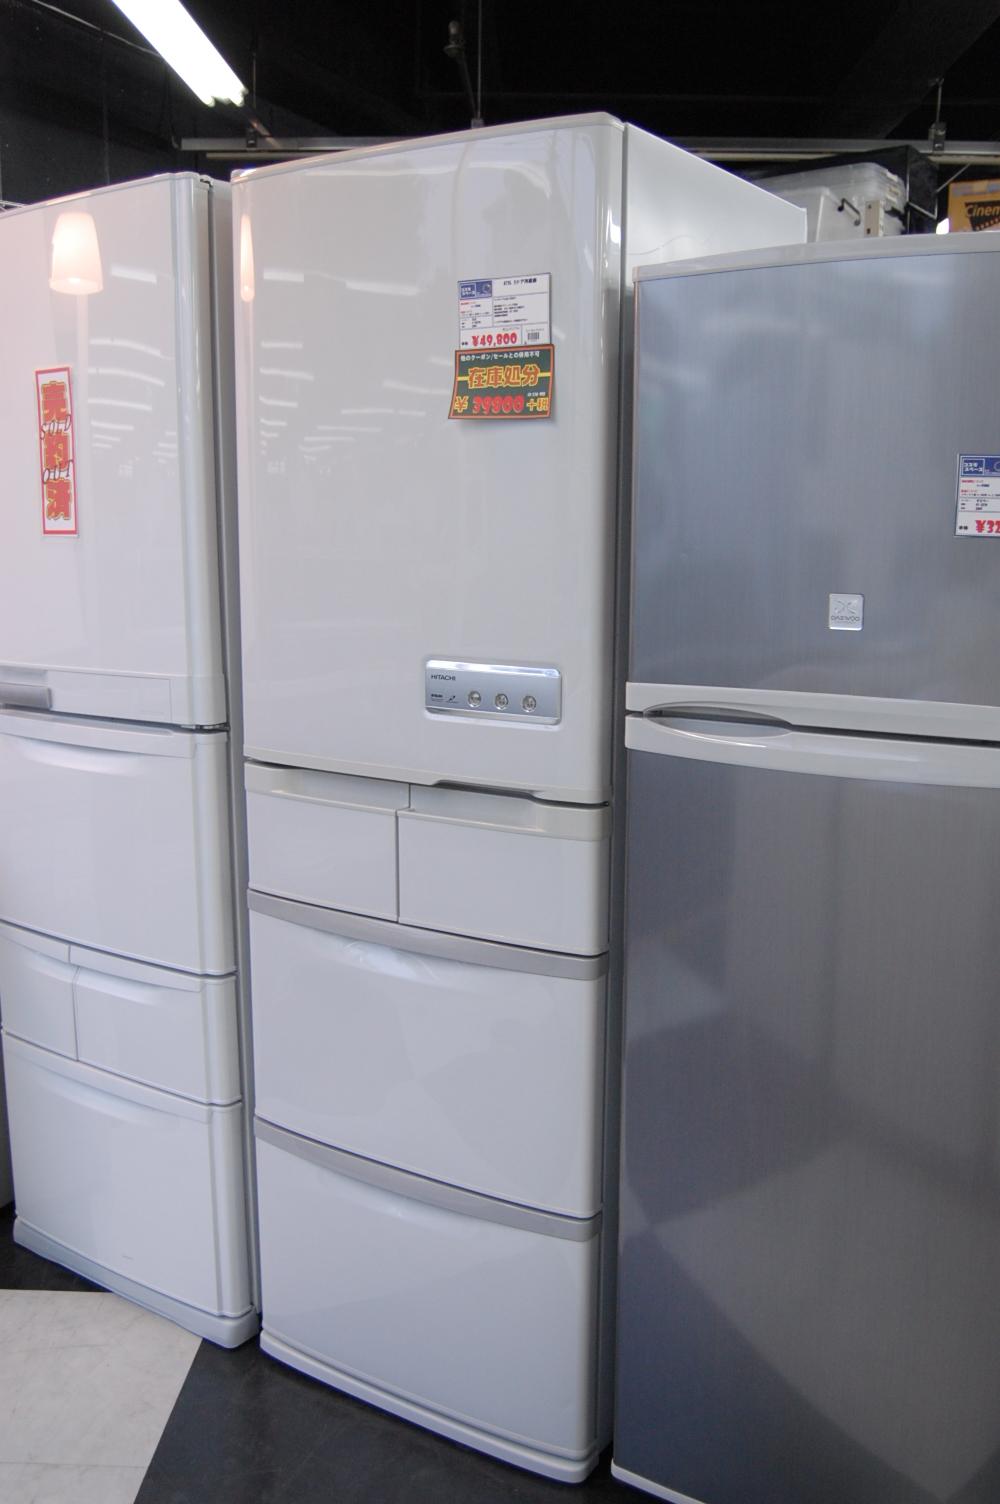 415L 5ドア冷蔵庫 自動製氷機能付き